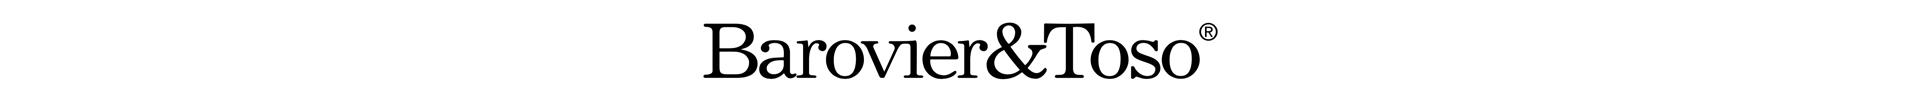 Barovier&Toso_Logo_Indoor_Möbel_&_Accessoires